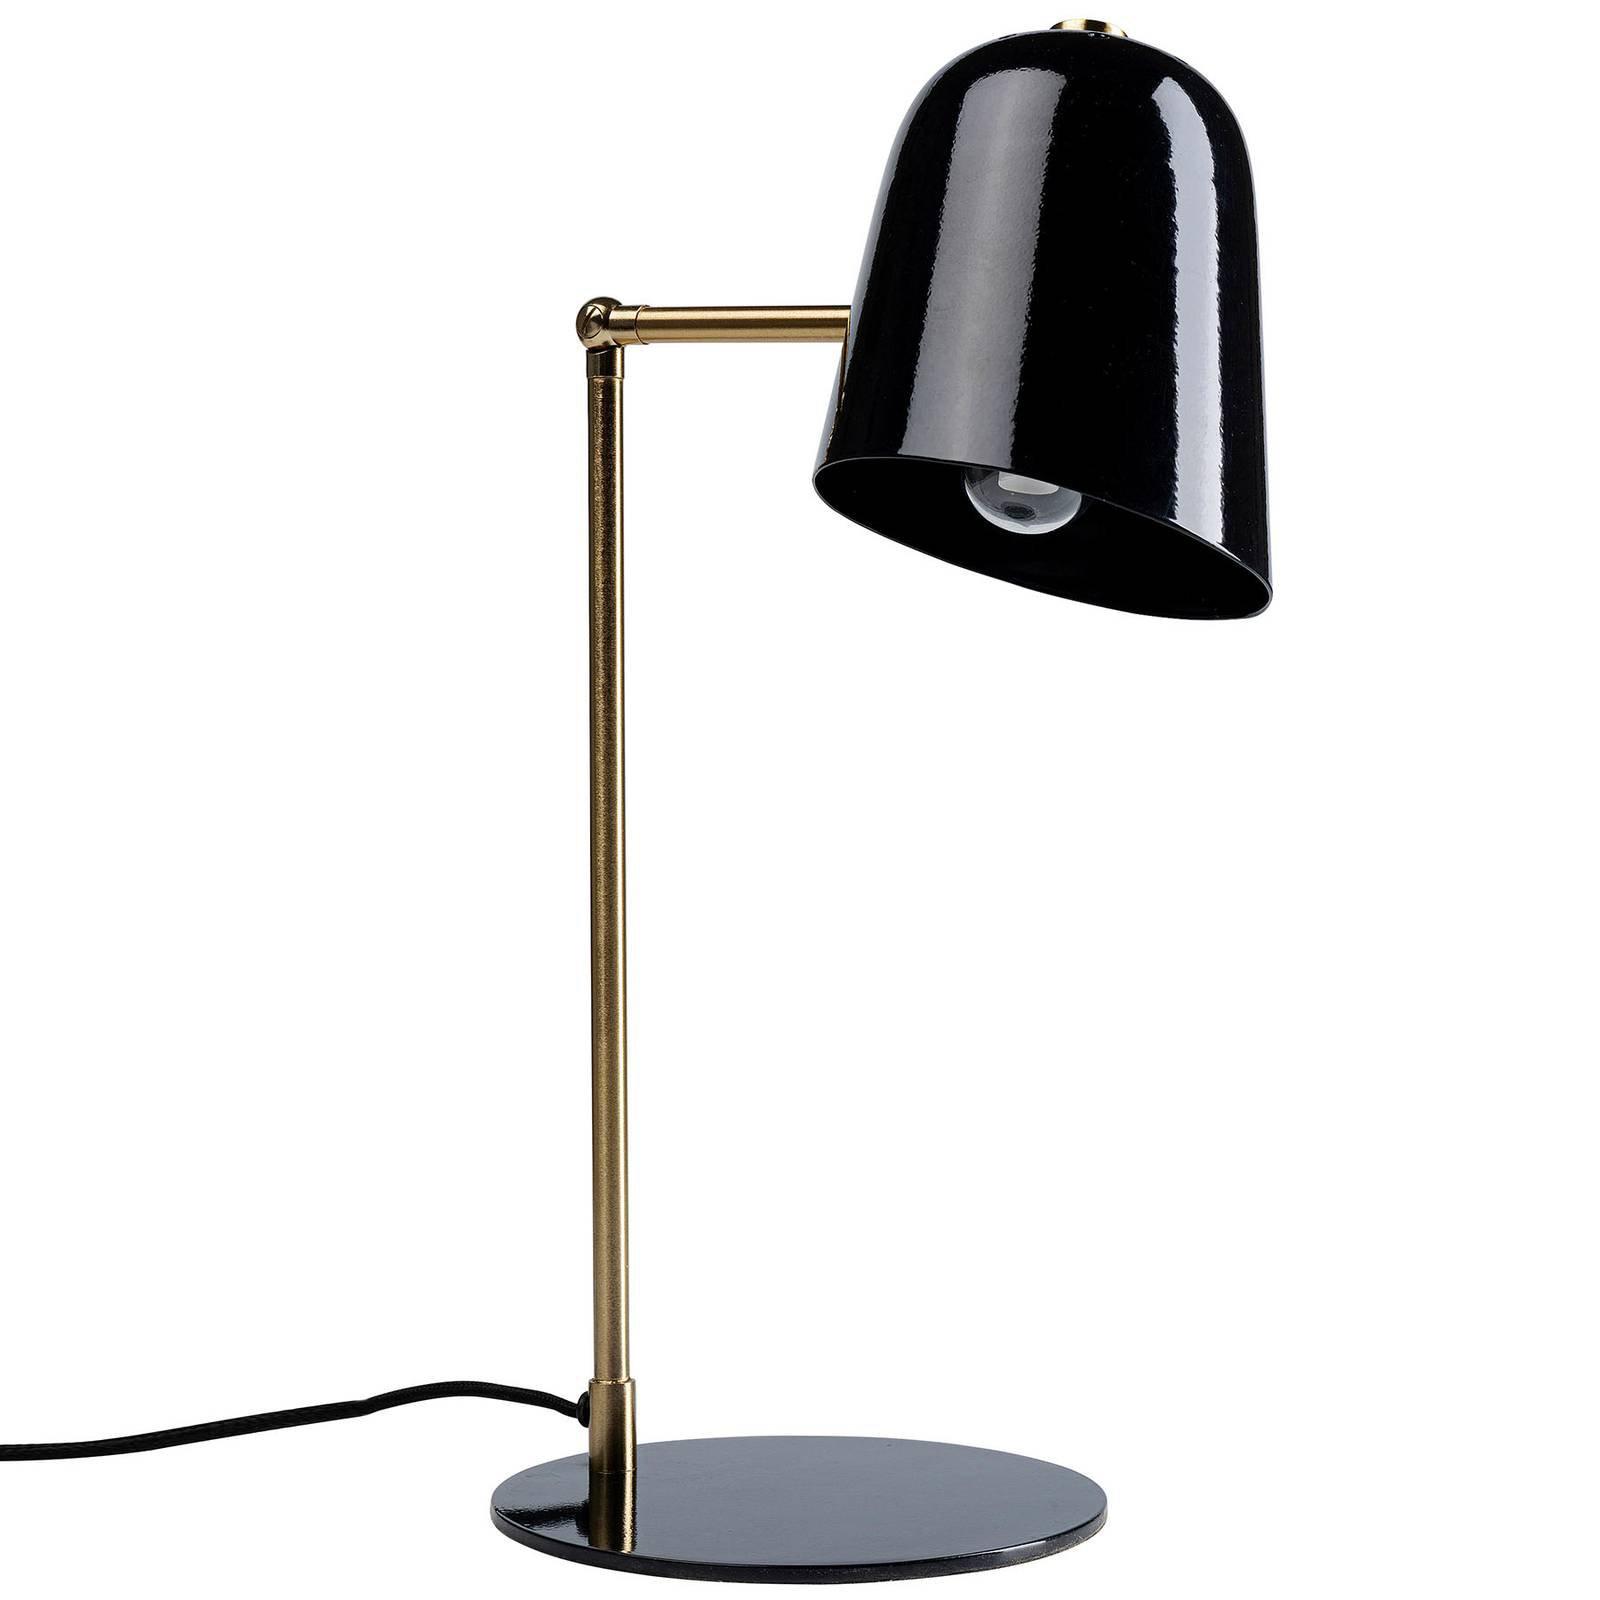 KARE Theater bordlampe, svart